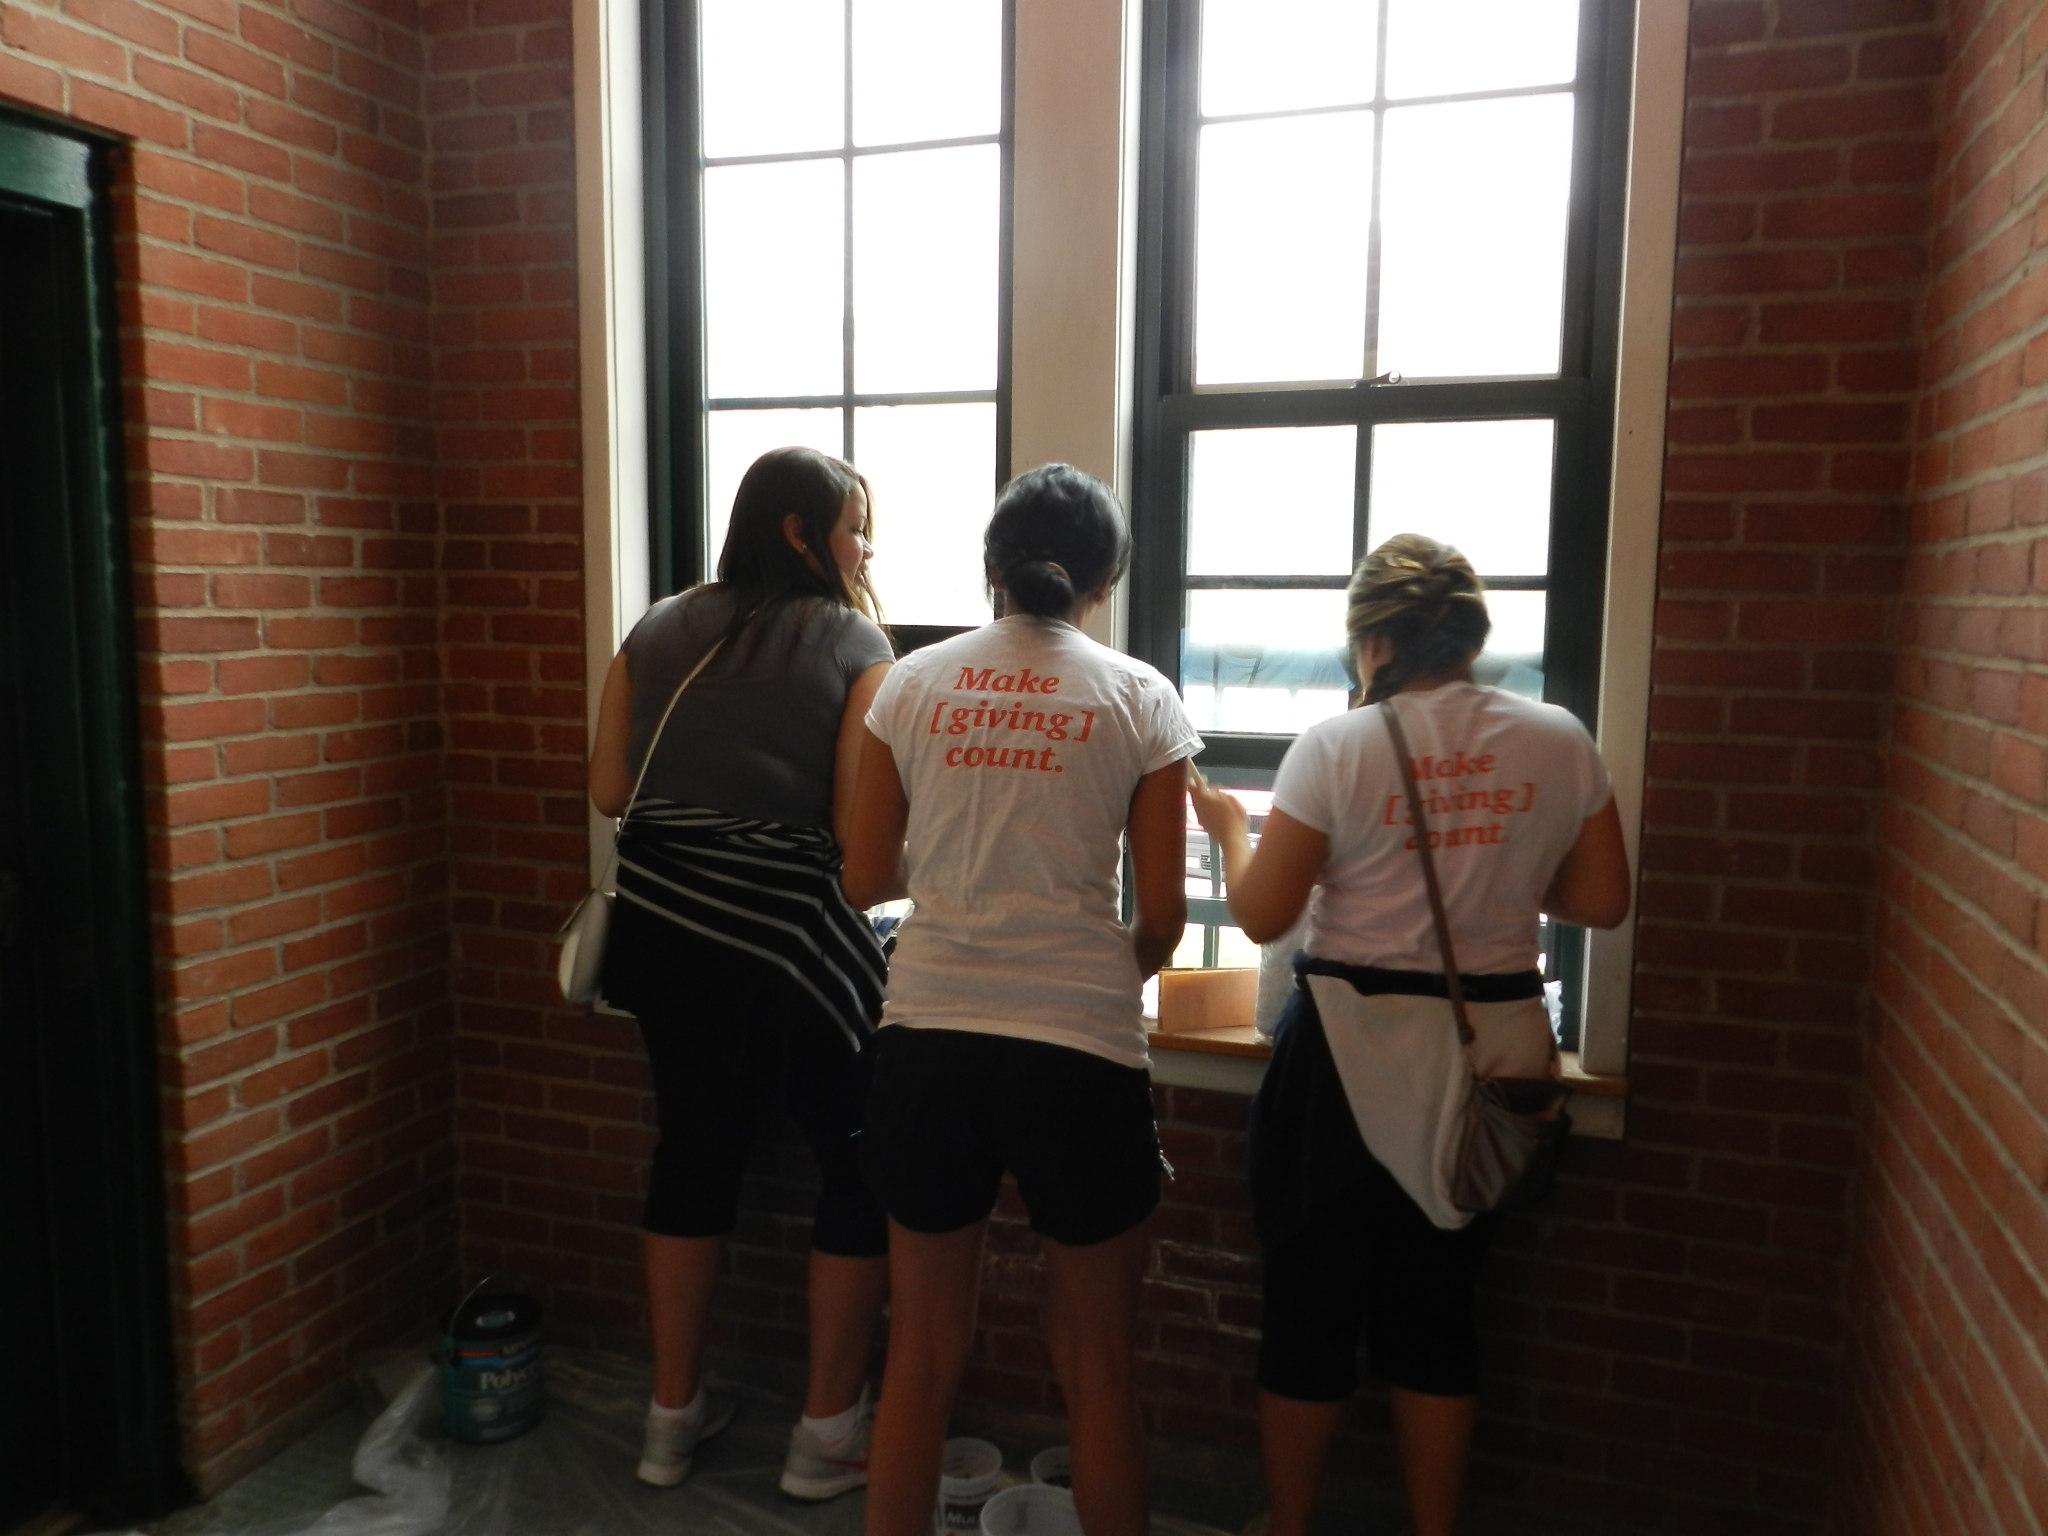 Volunteers from PricewaterhouseCoopers help refinish apartment furniture.